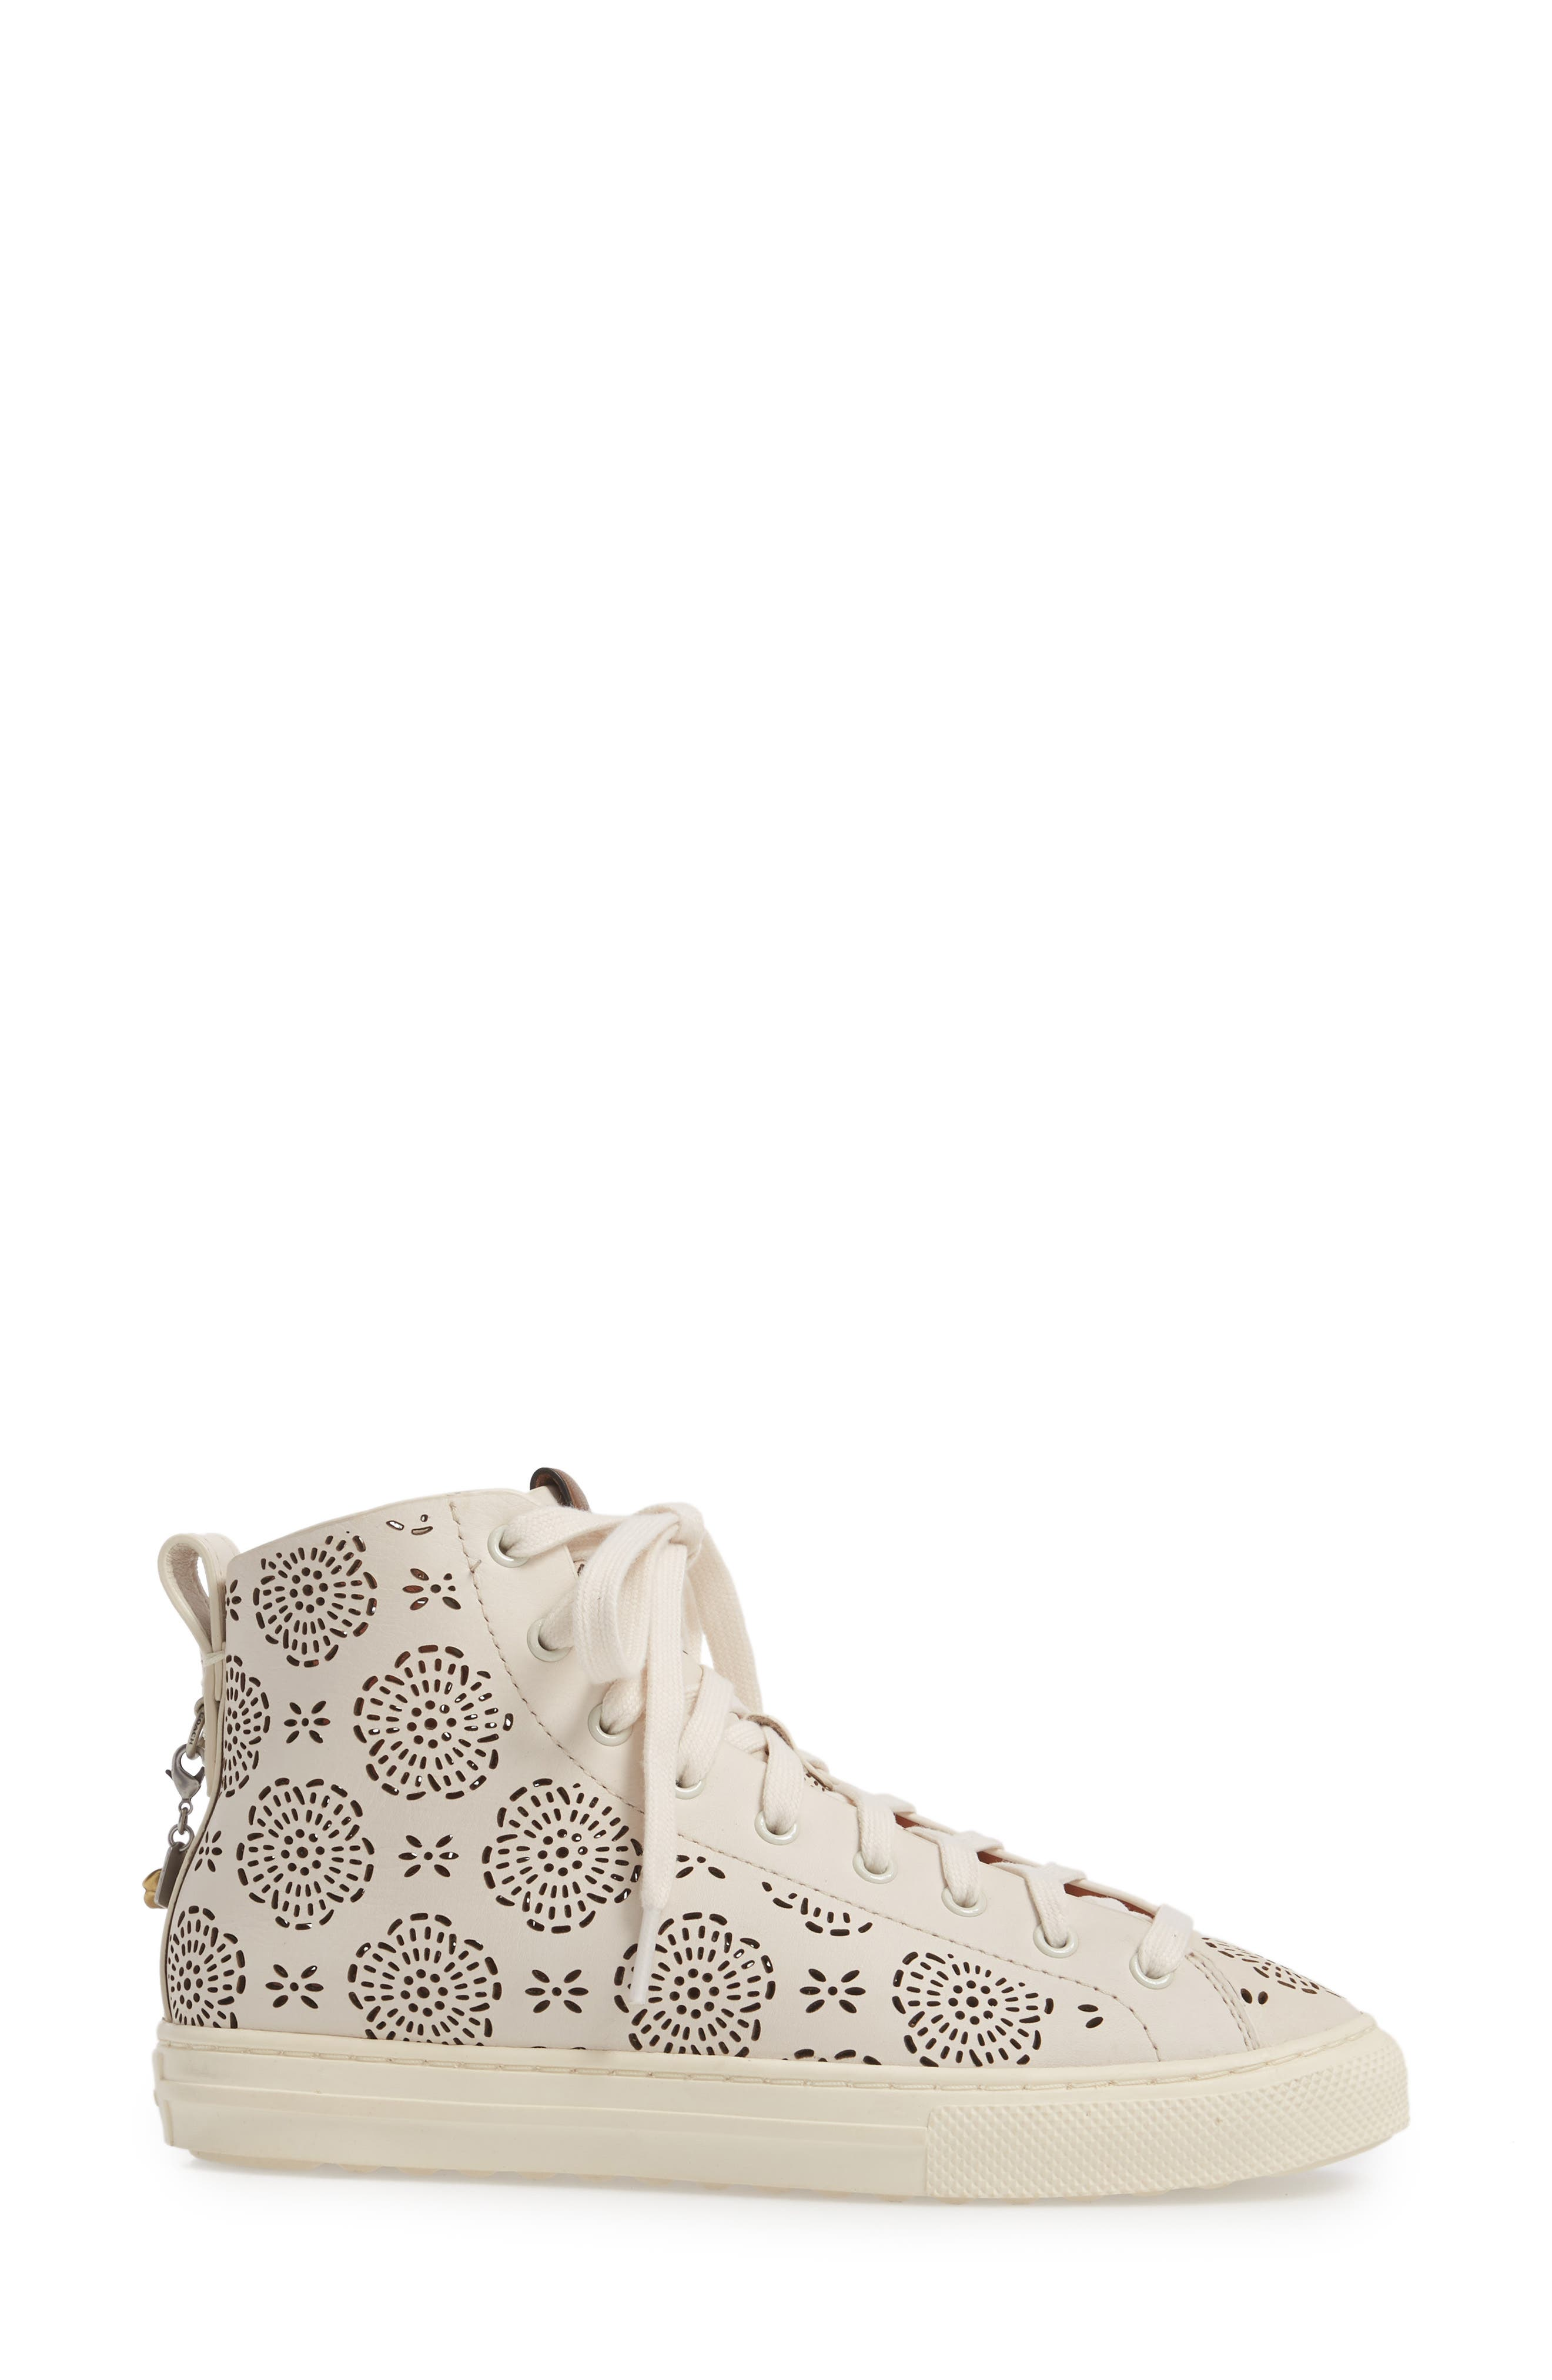 Tea Rose Cutout High Top Sneaker,                             Alternate thumbnail 3, color,                             Chalk Leather